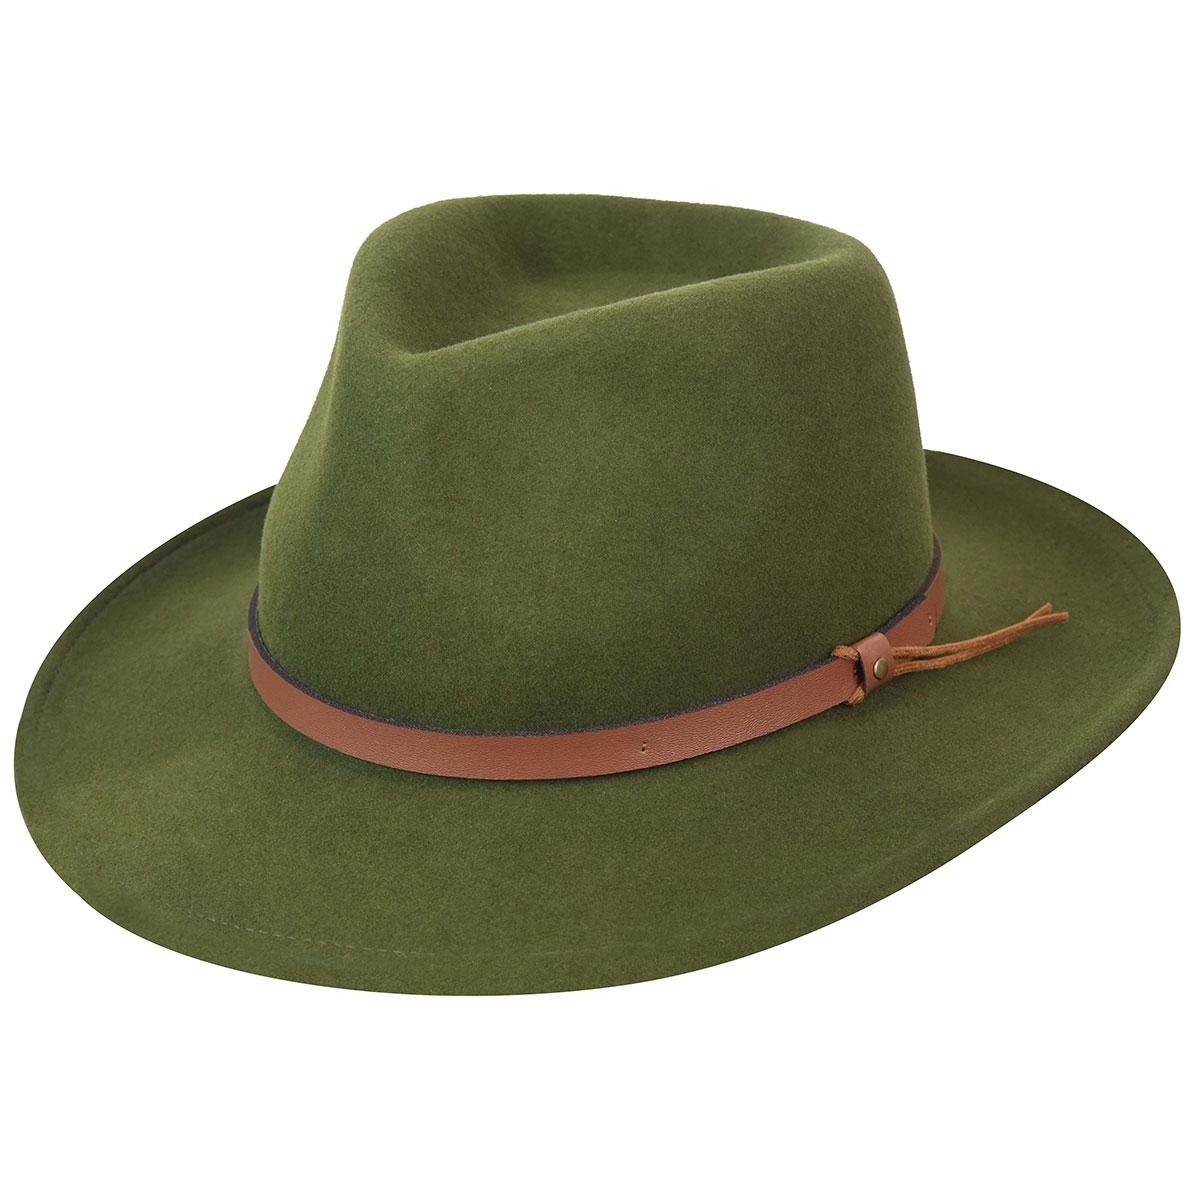 Pantropic Dakota LiteFelt Outback in Olive